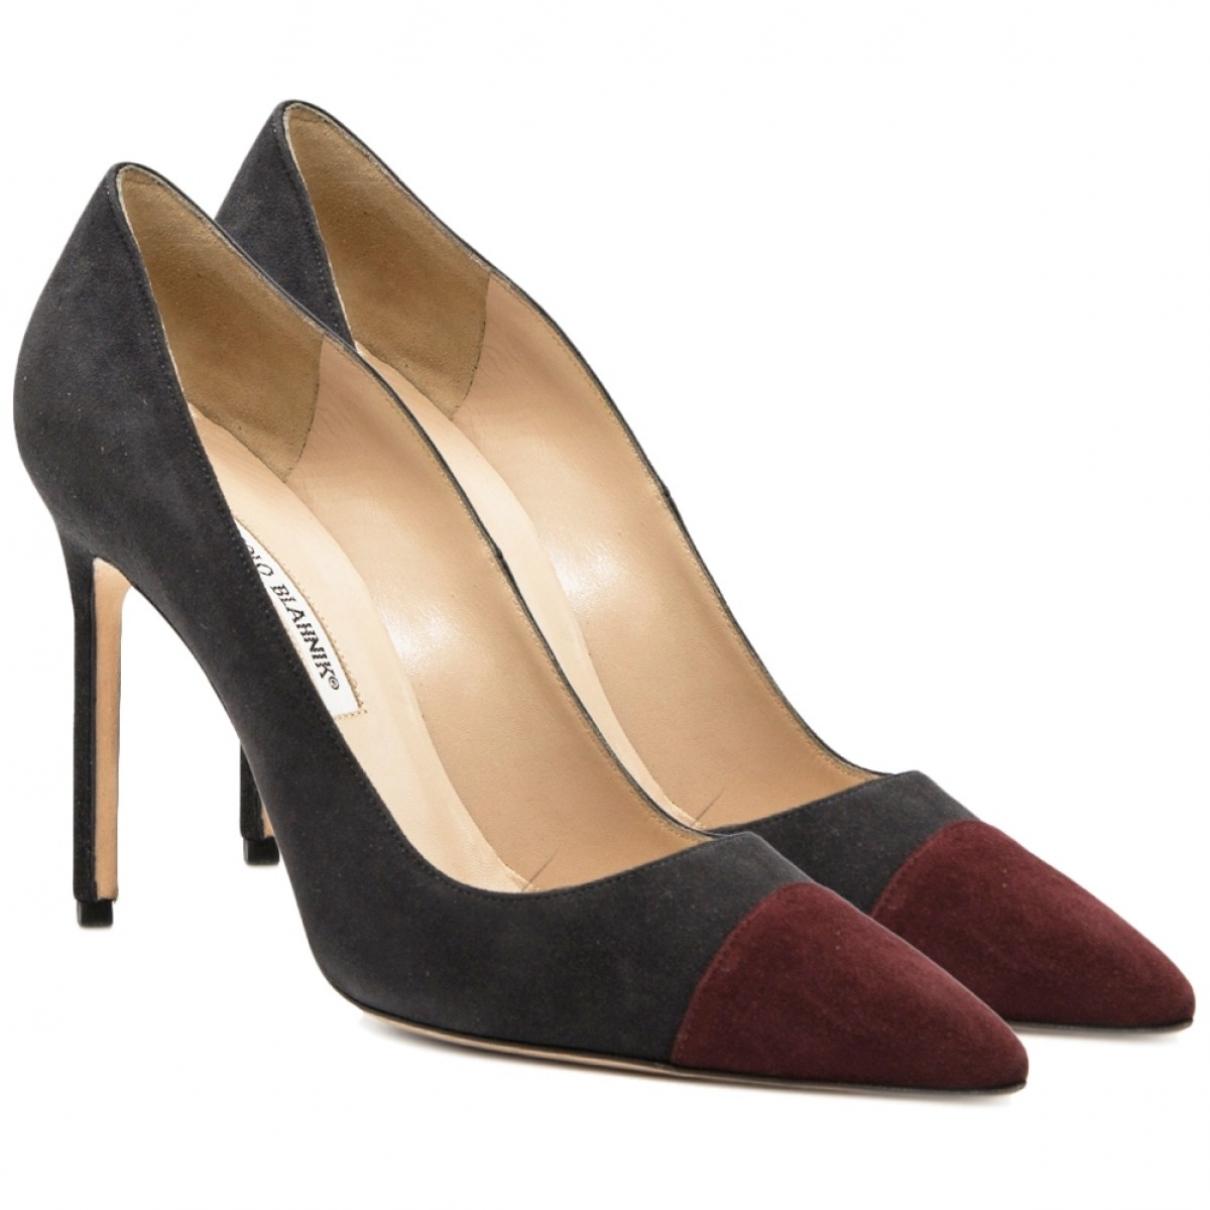 Manolo Blahnik \N Black Suede Heels for Women 39.5 EU